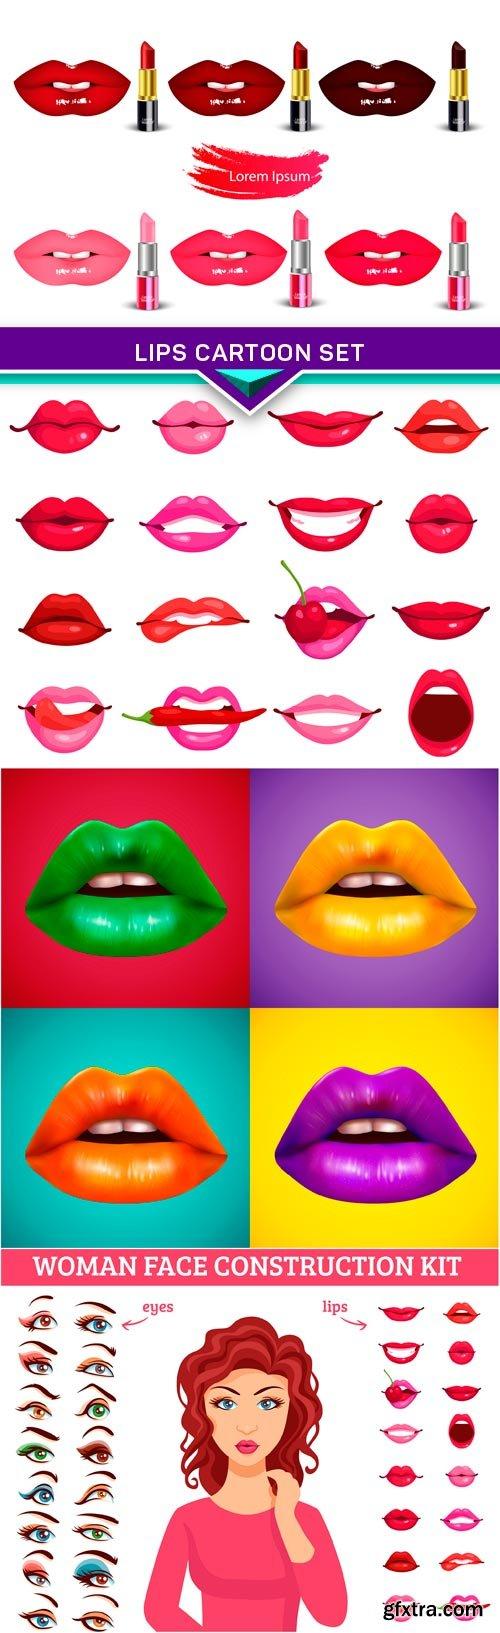 Lips Cartoon Set 4X EPS